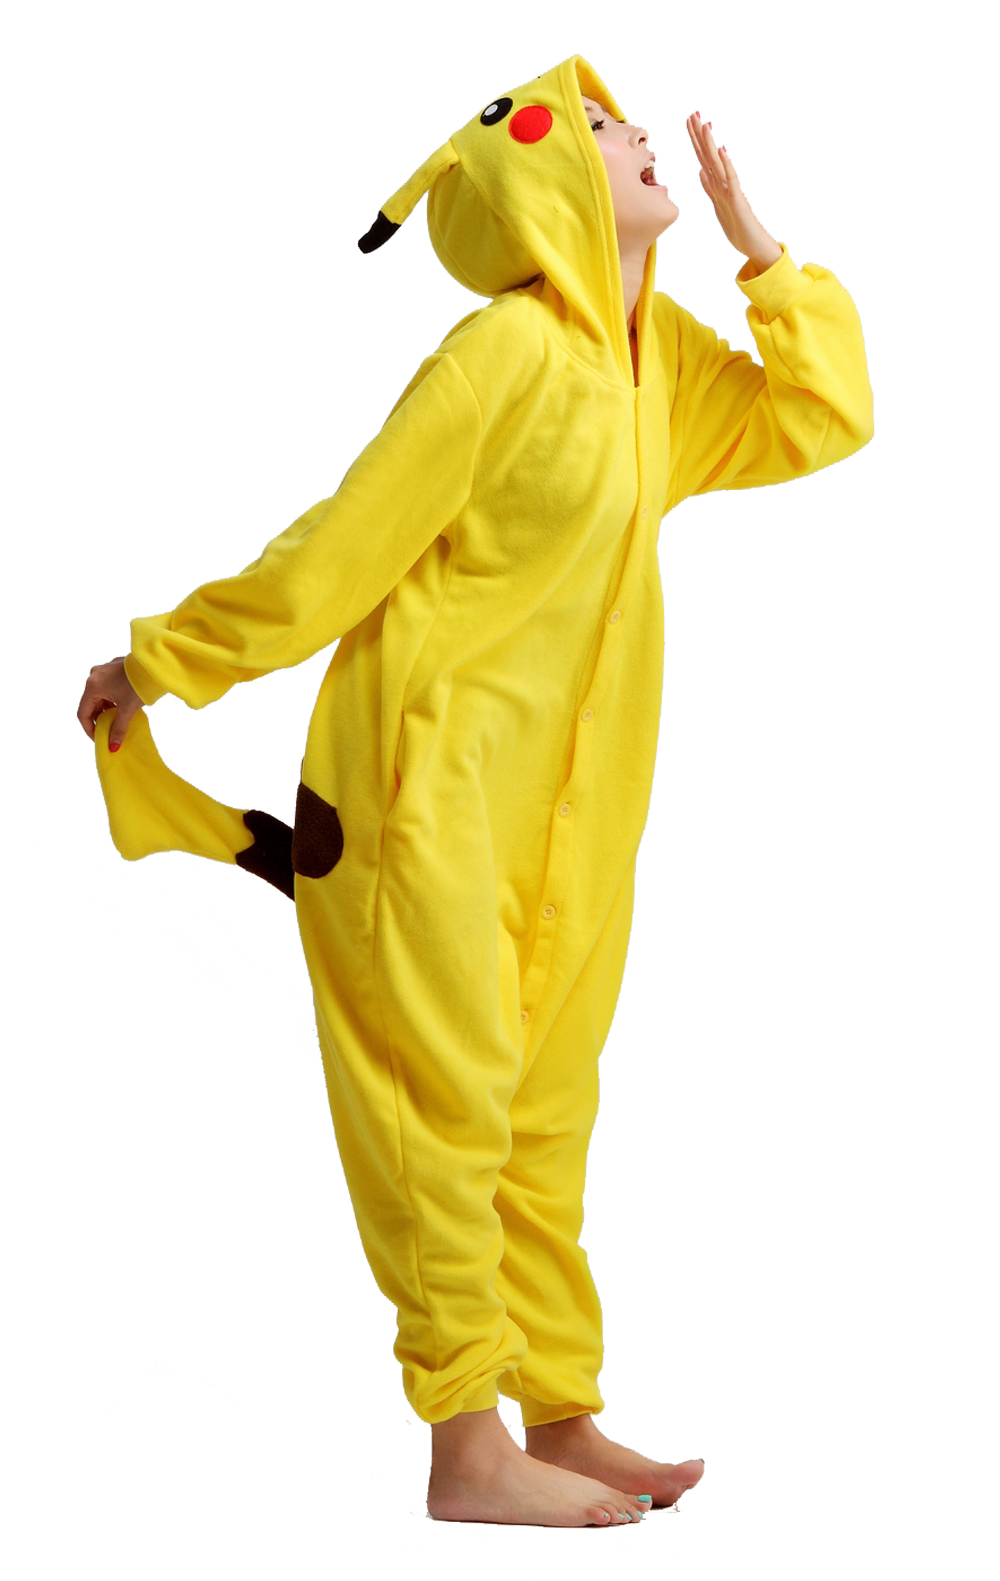 Pika pika pikachu pokemon porn - 4 3